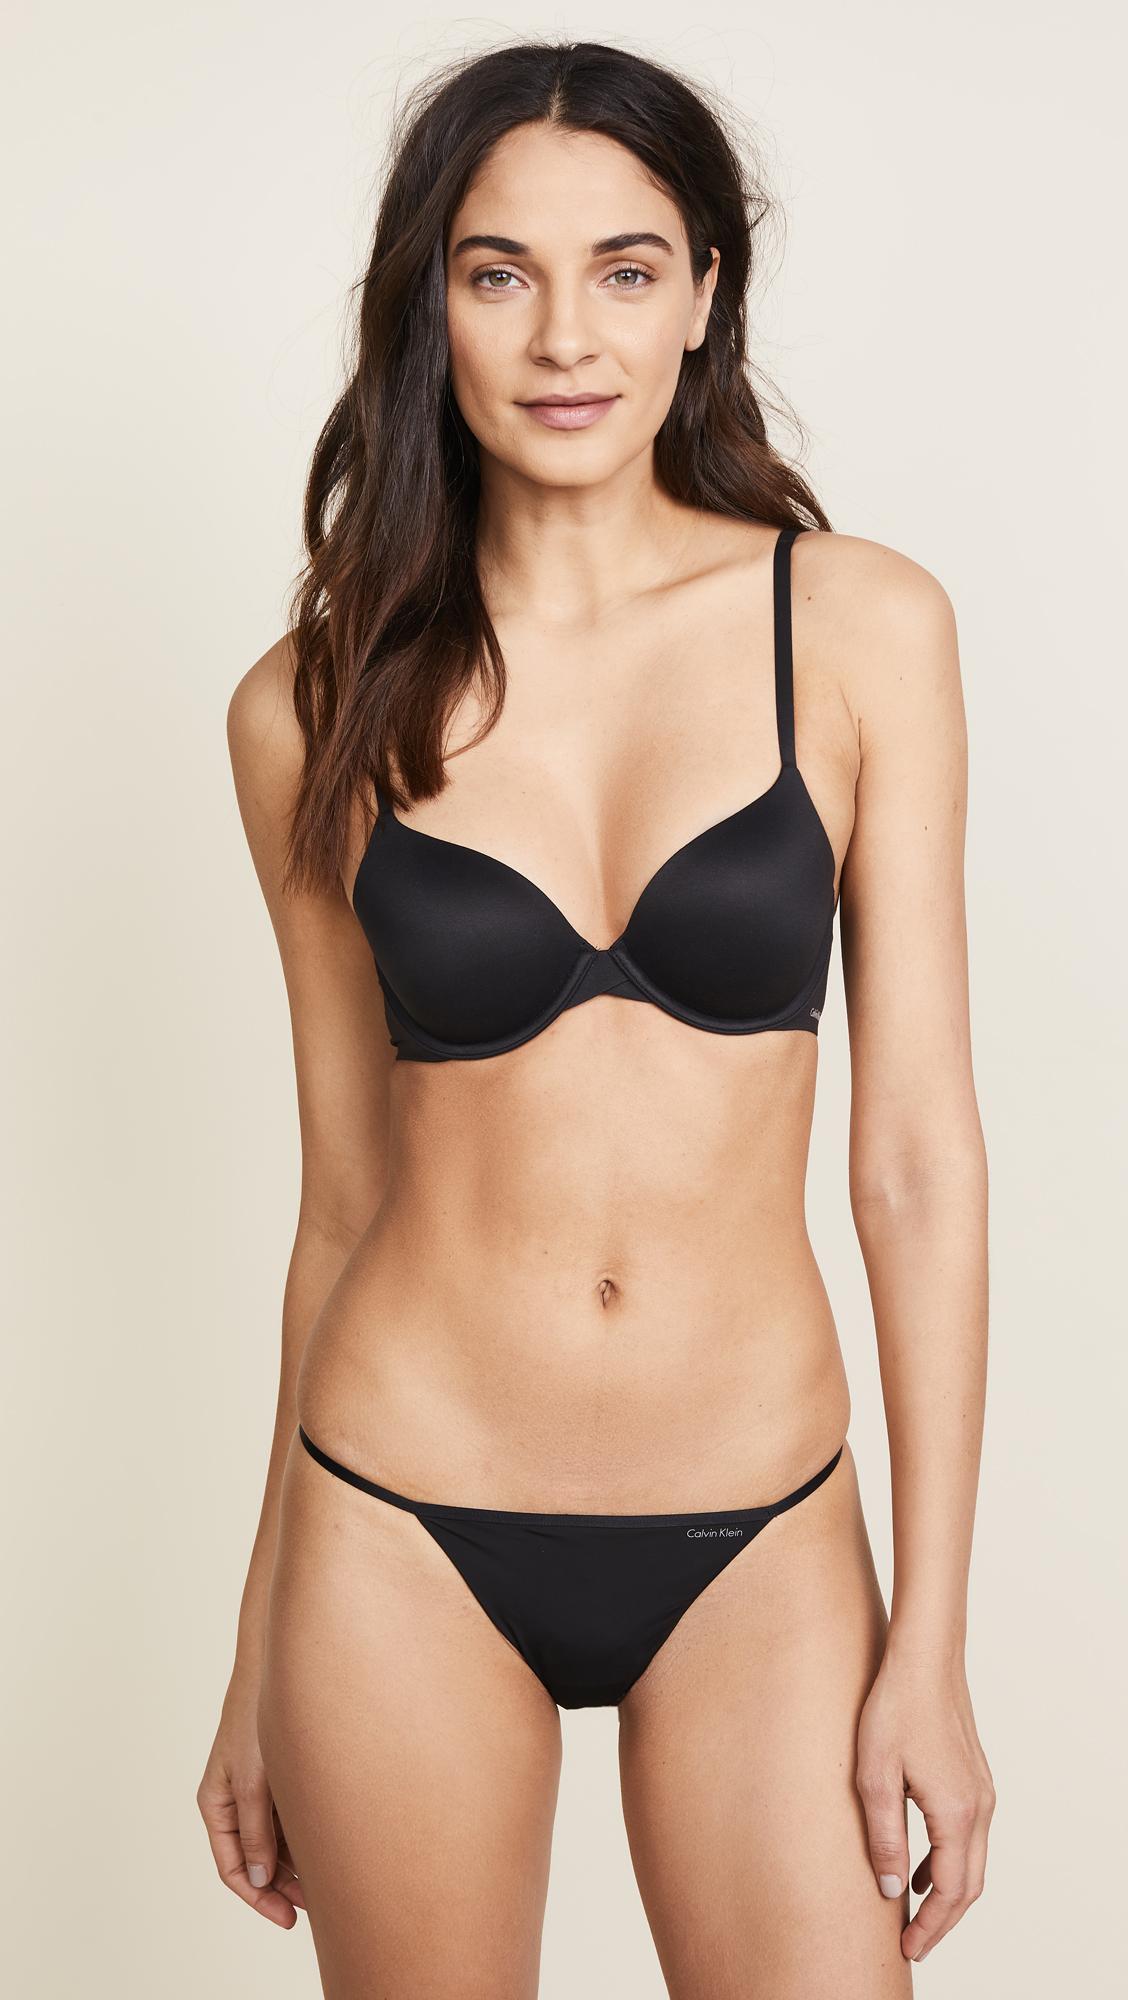 e6898ecd8c Calvin Klein Underwear Sleek Model Thong